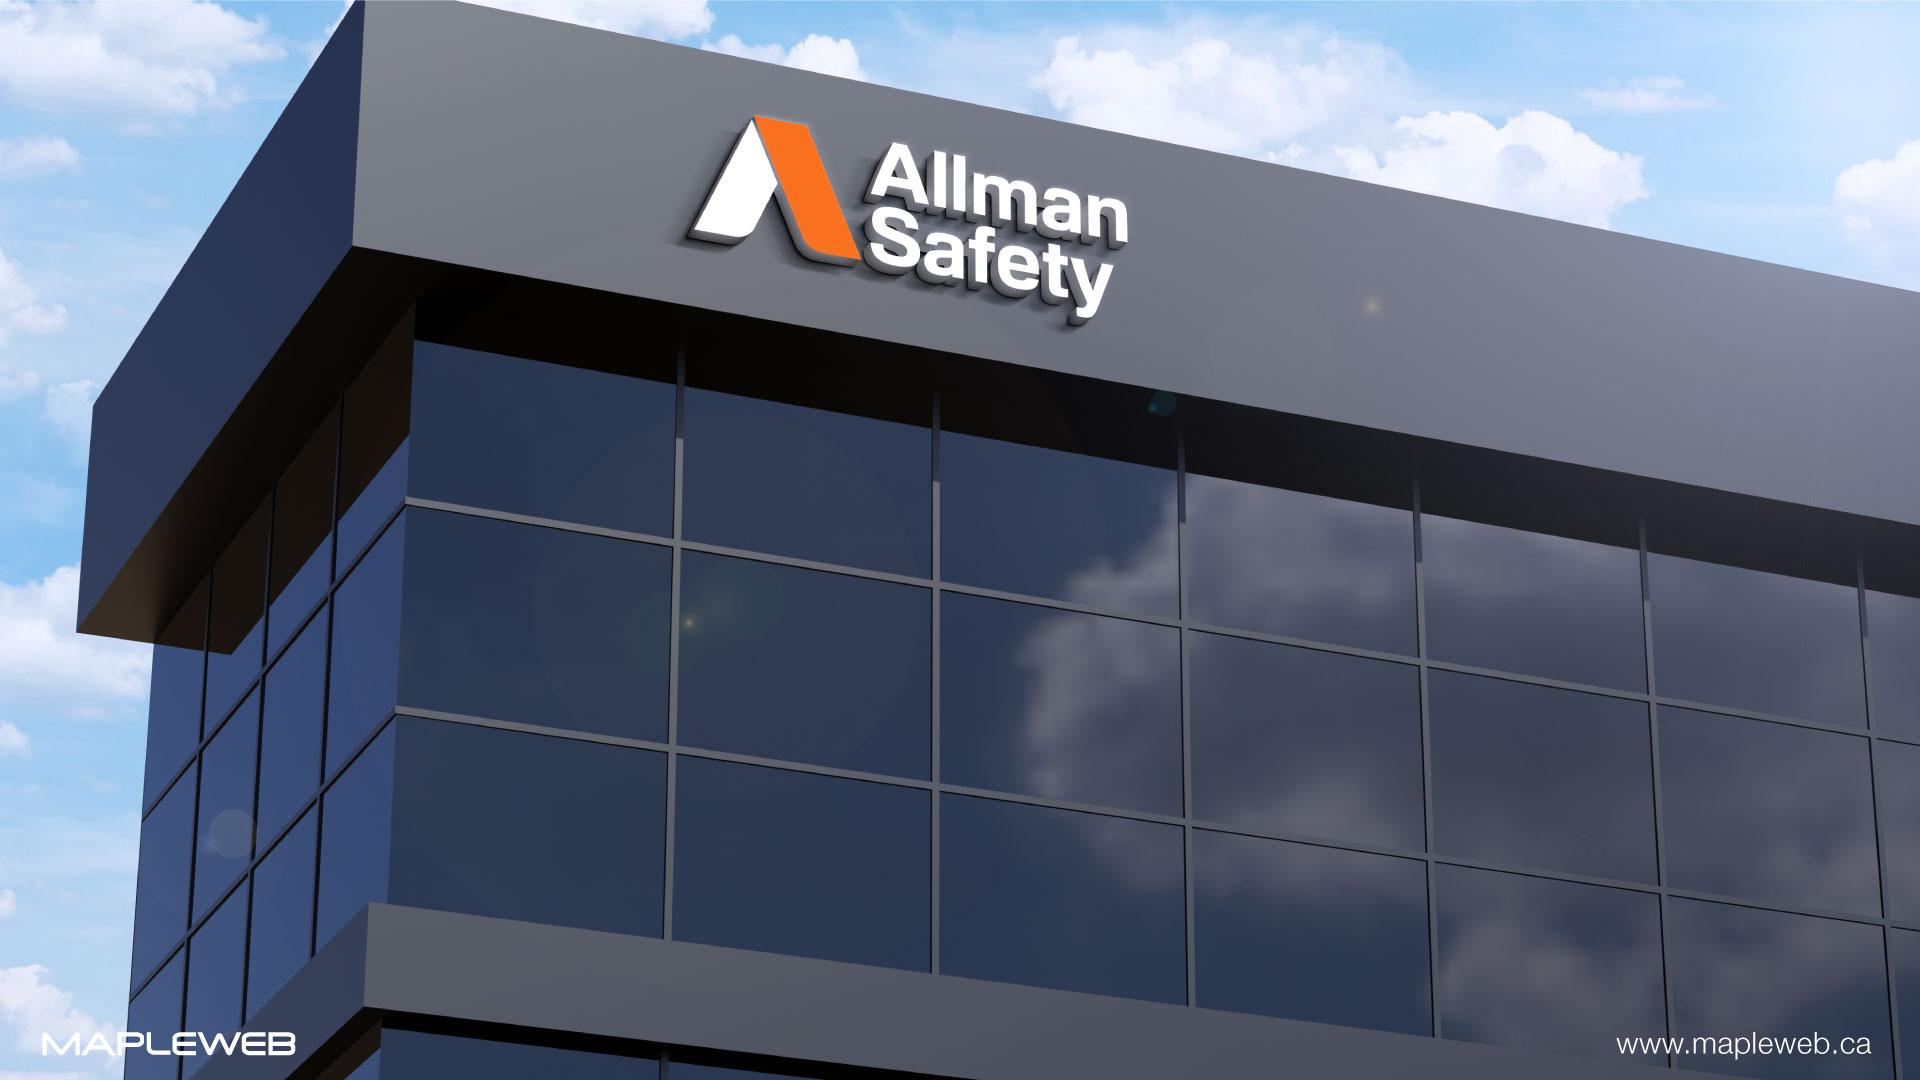 allman-safety-brand-logo-design-by-mapleweb-vancouver-canada-building-mock